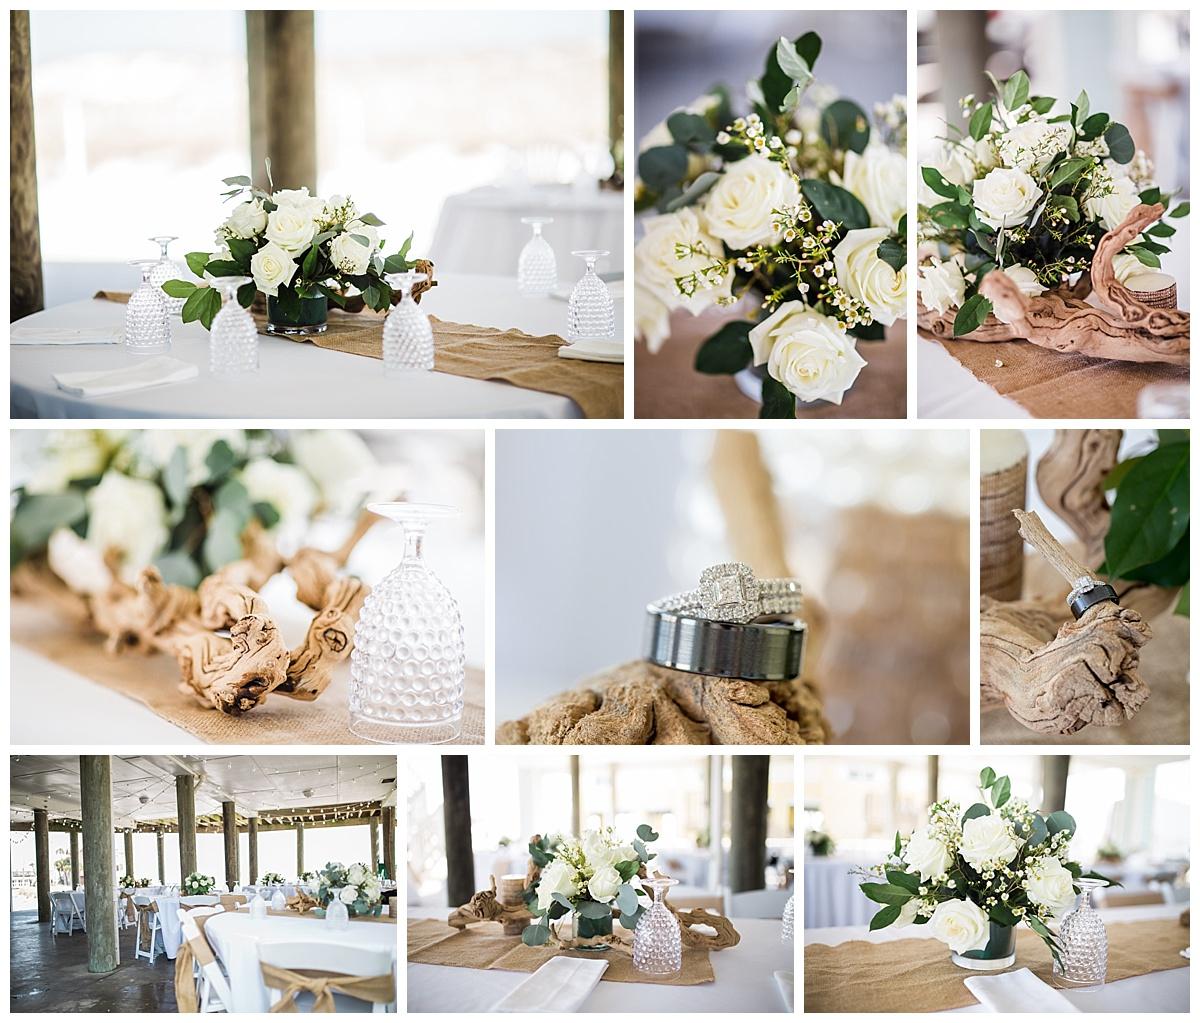 Reception Decor for your wedding